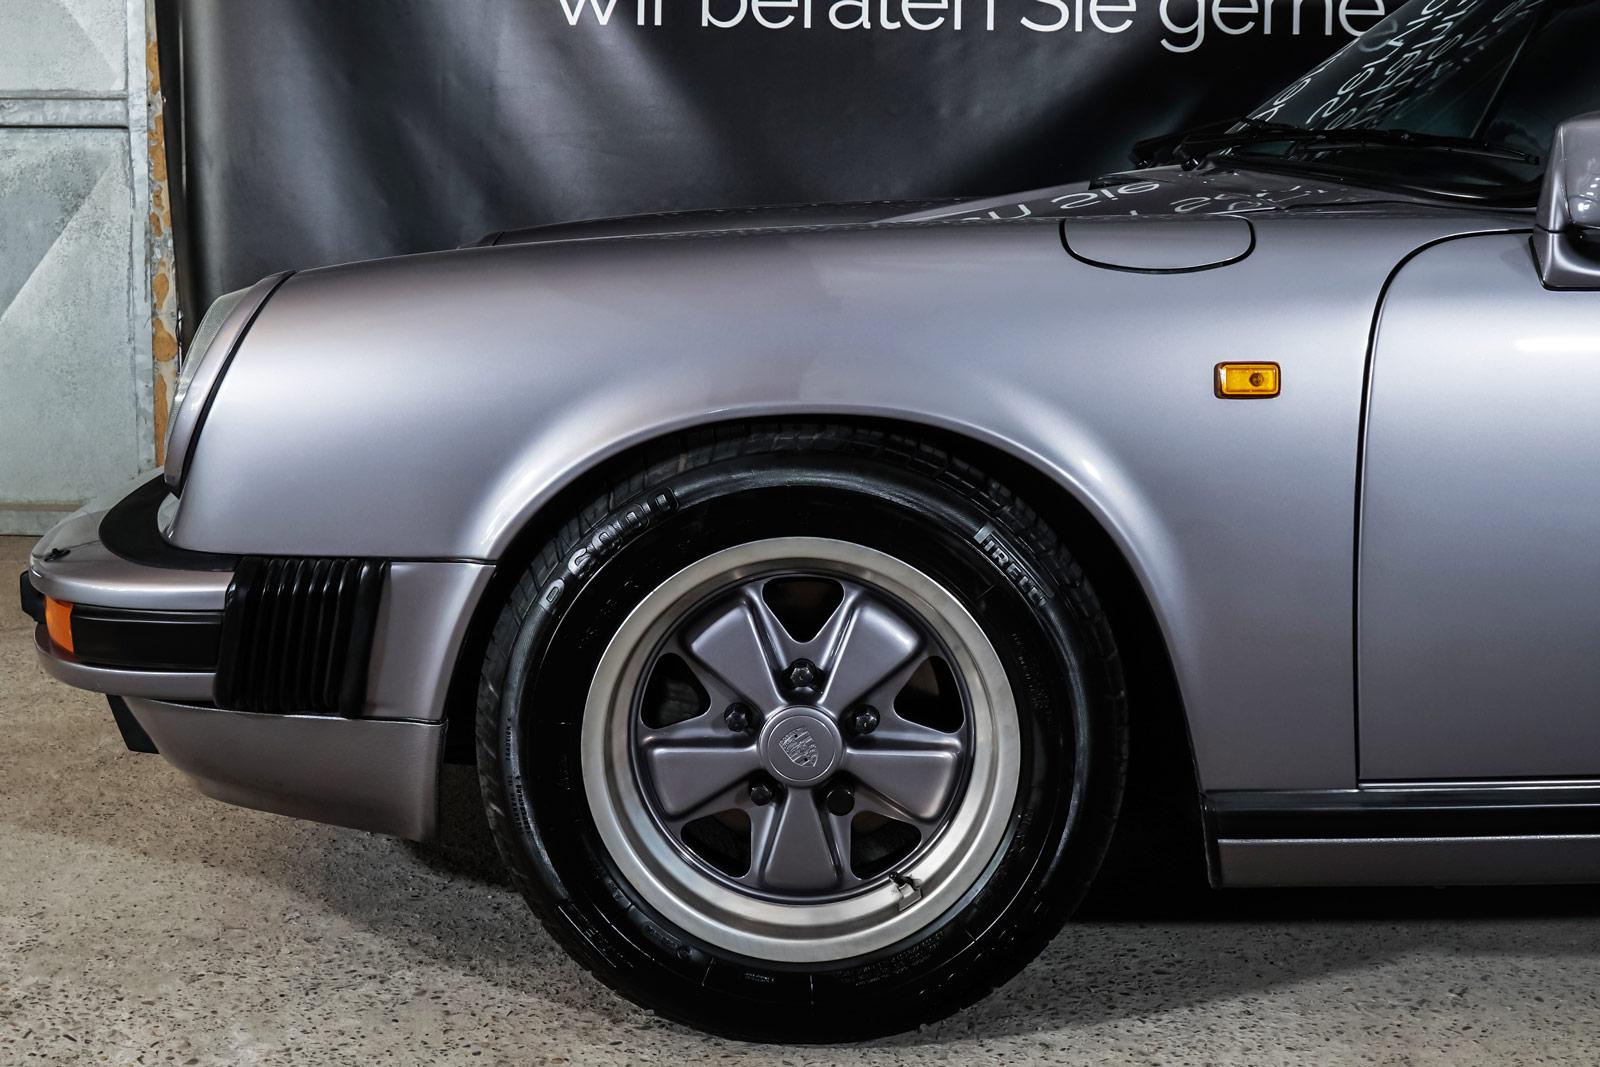 Porsche_911_Targa_Diamantblaumetallic_Blau_POR-0092_3_w